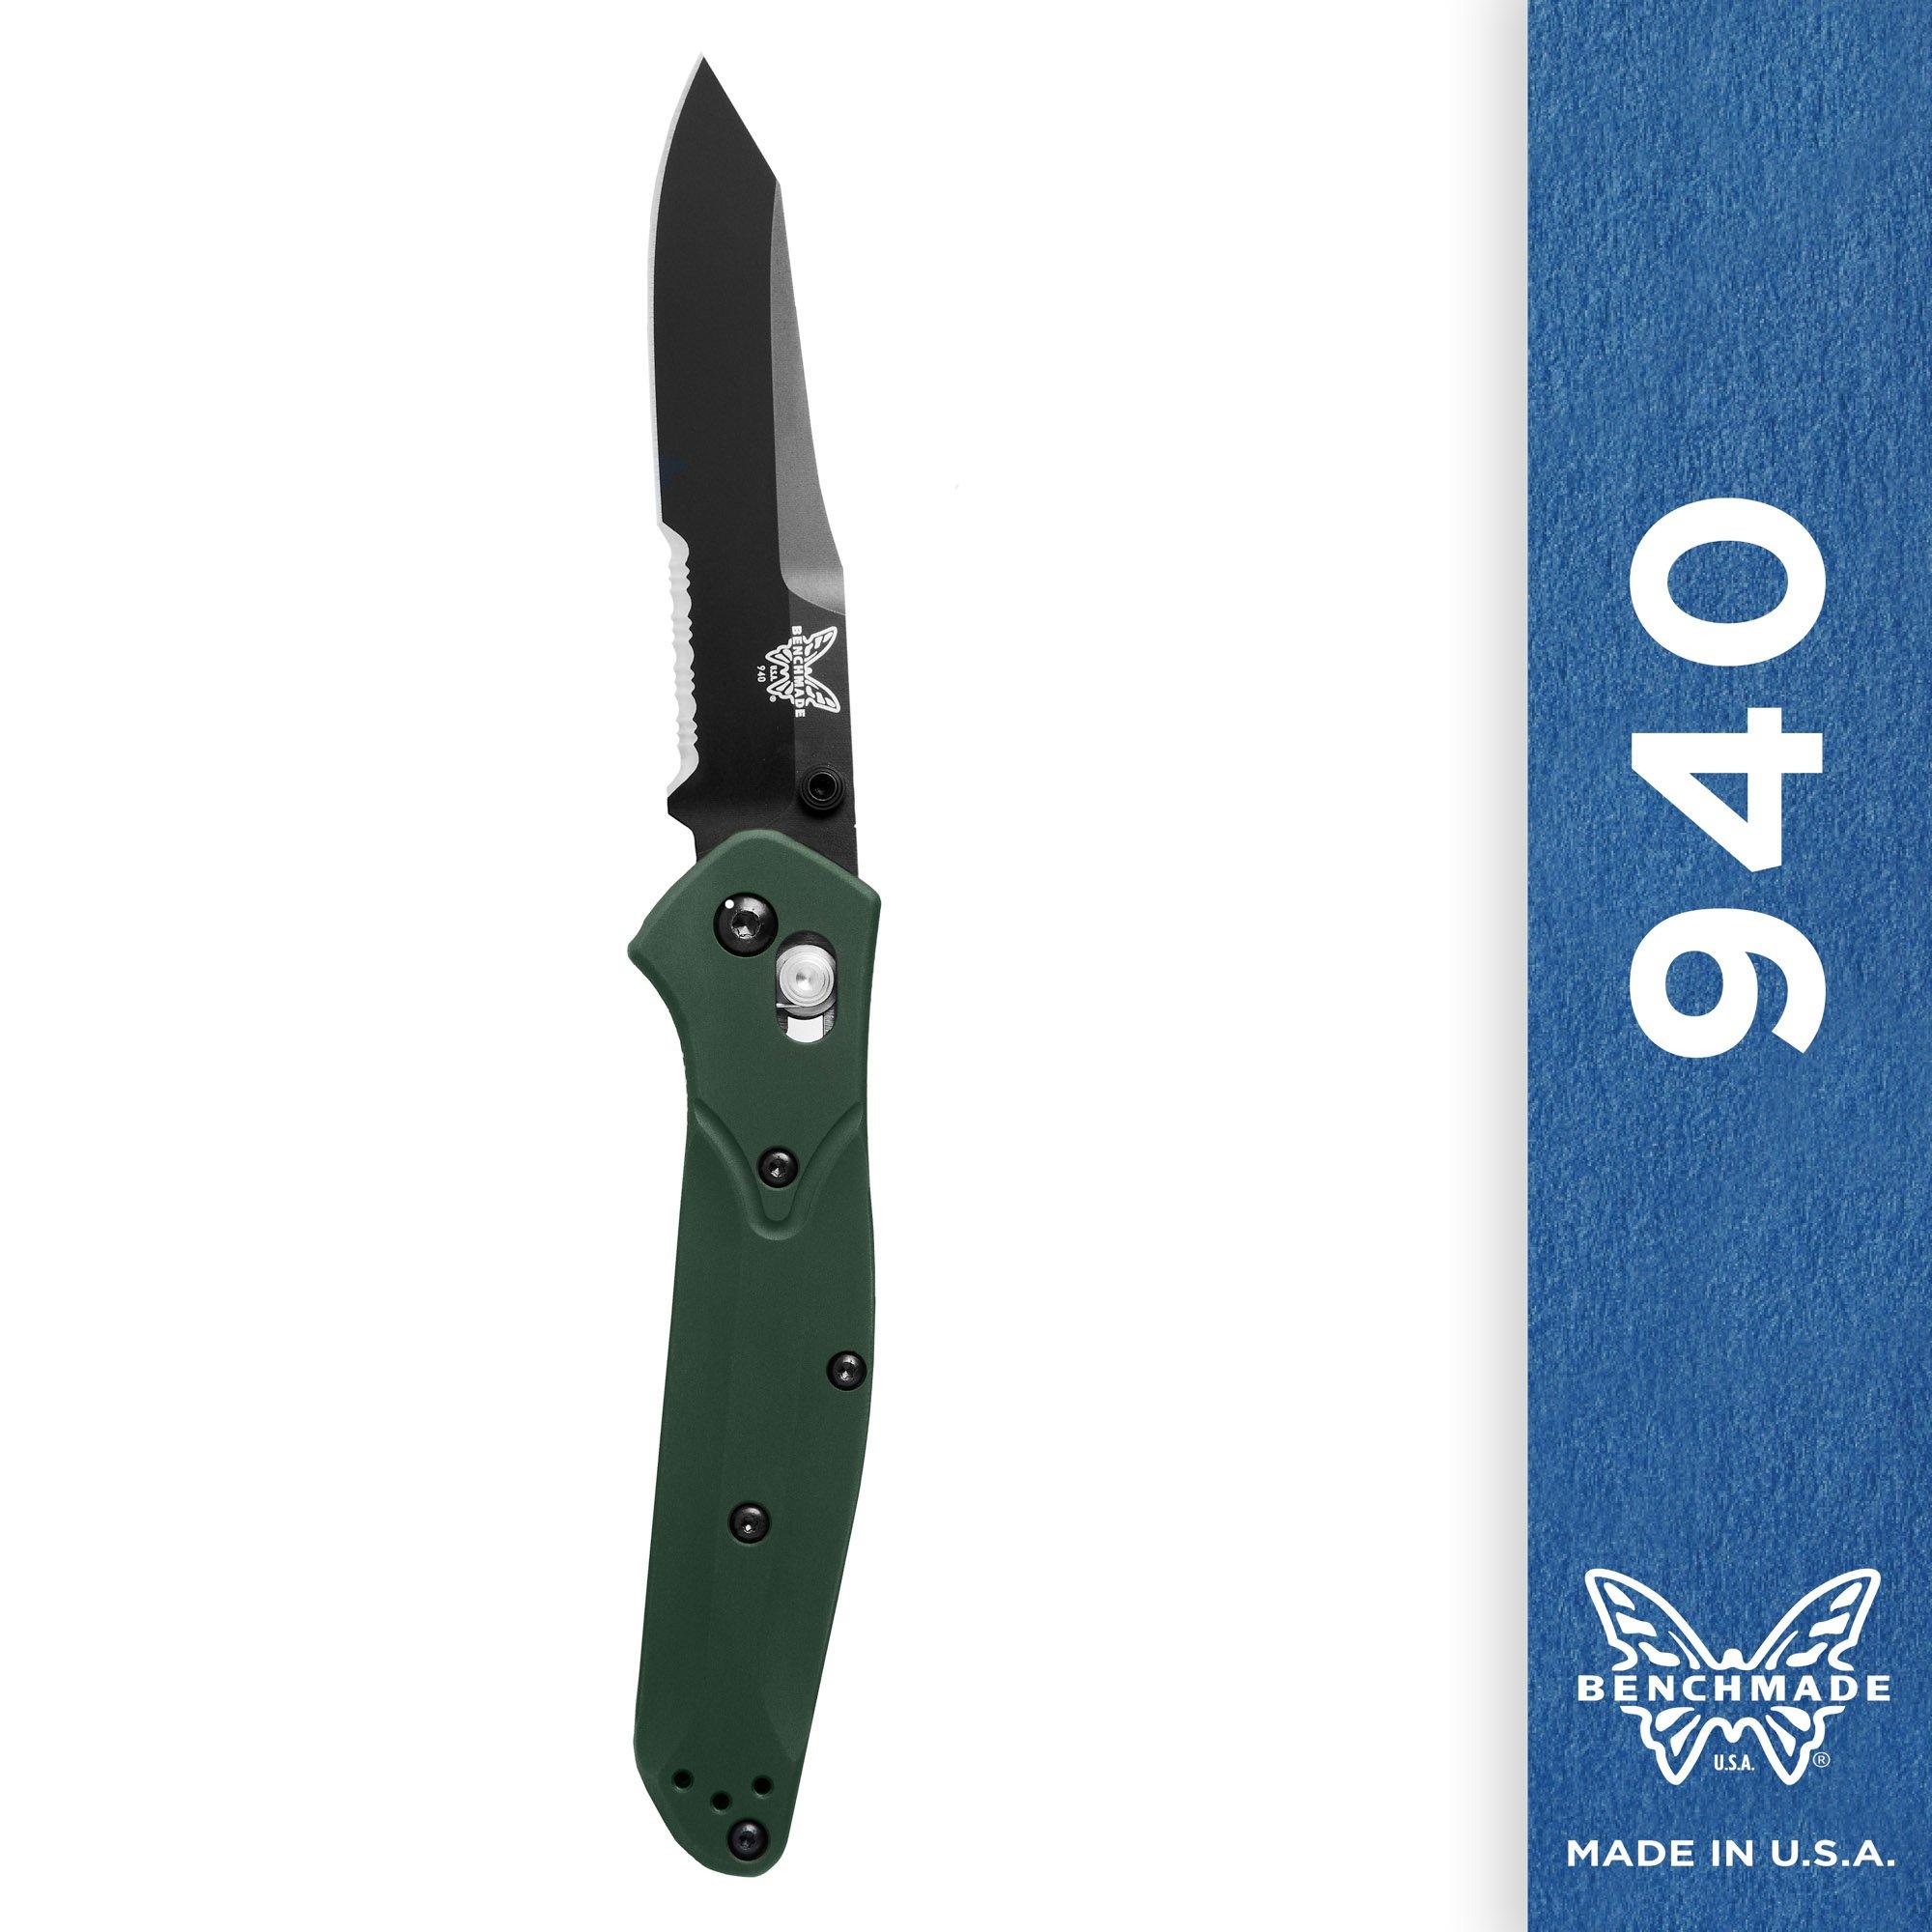 Benchmade Knife 940SBK Black Combo Edge Blade, Green Aluminum Handle